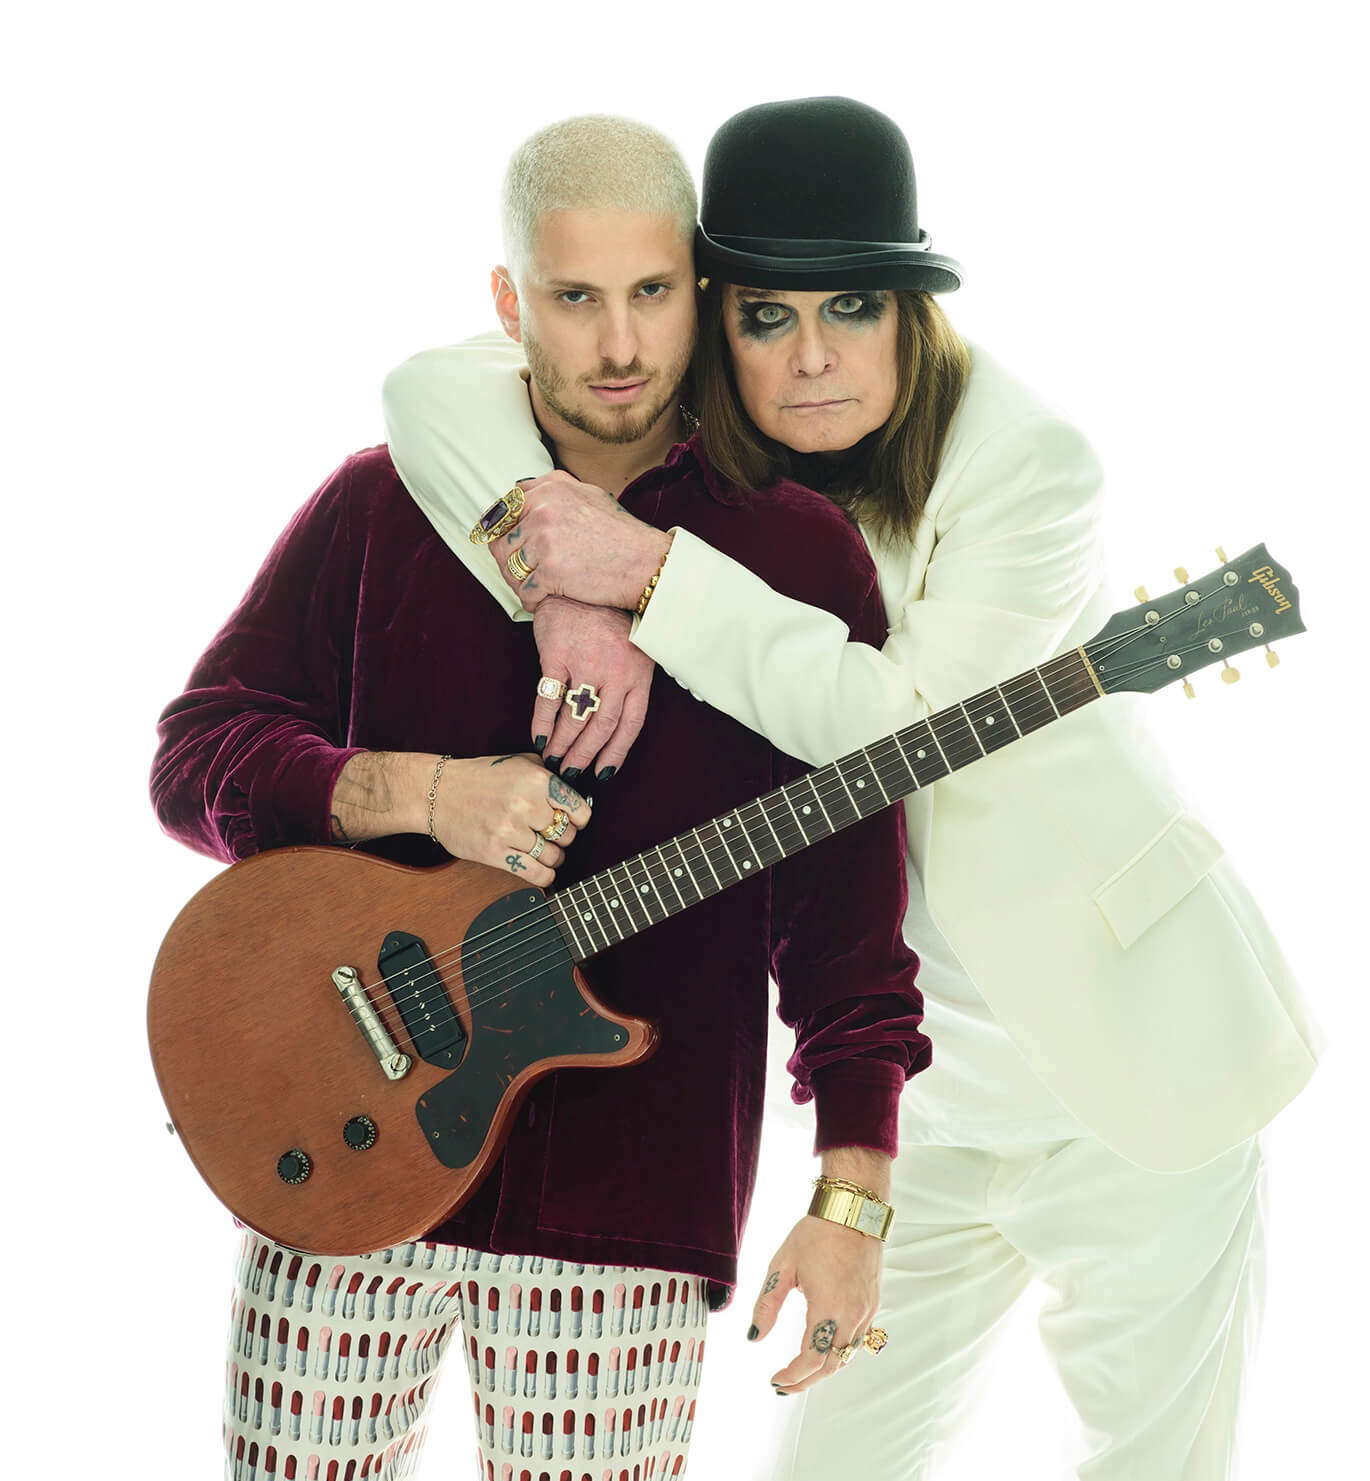 Andrew Watt and Ozzy Osbourne